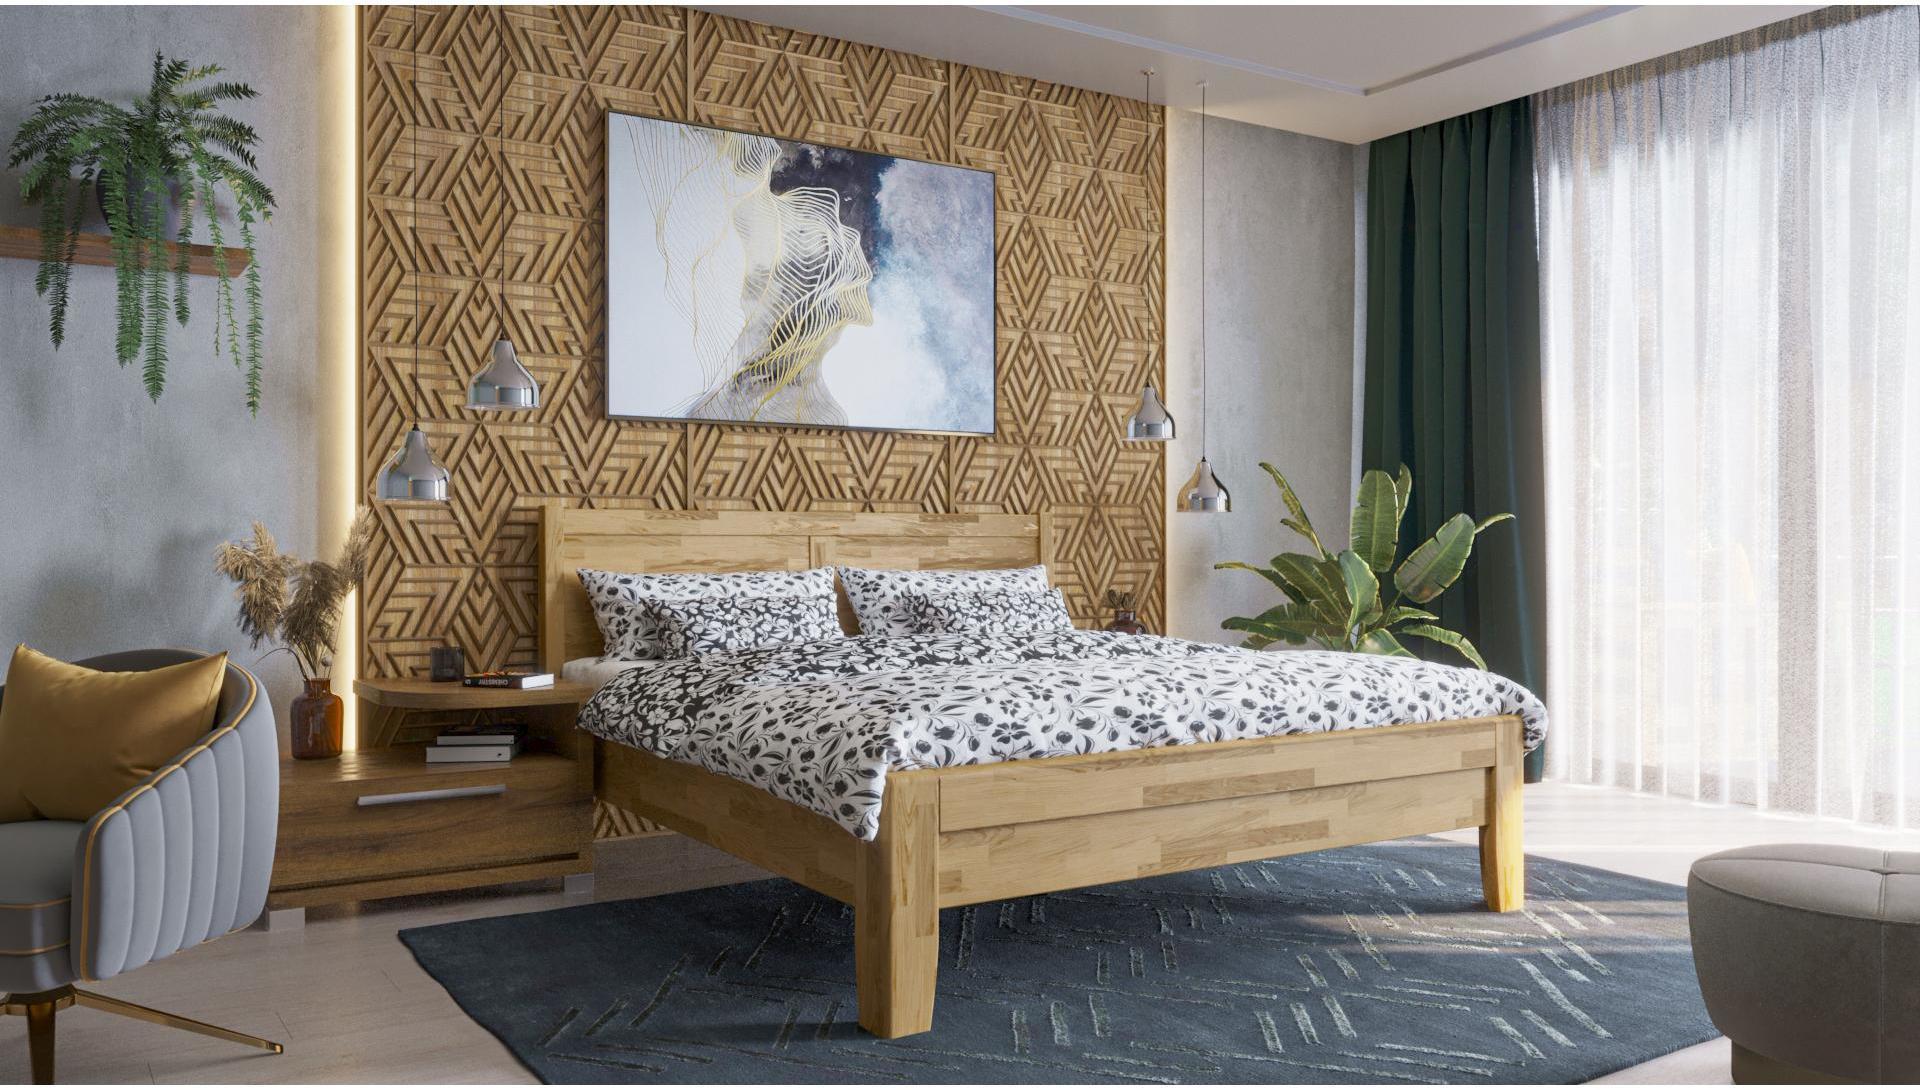 Celomasívna posteľ Celin K3 140x200 cm dub D1